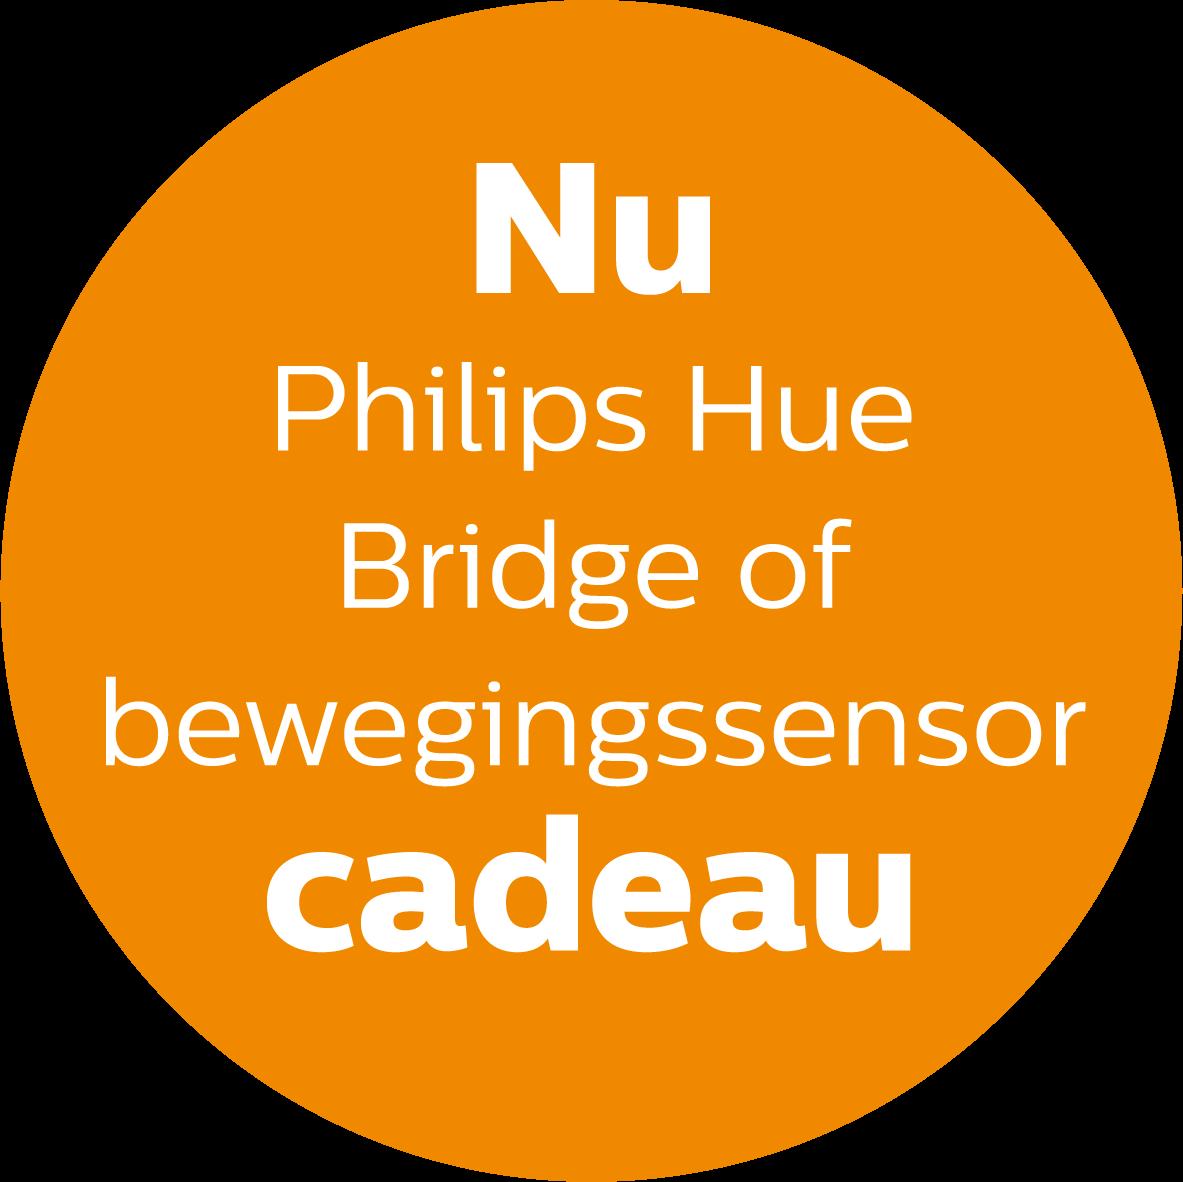 Philips Hue bridge of bewegingssensor cadeau